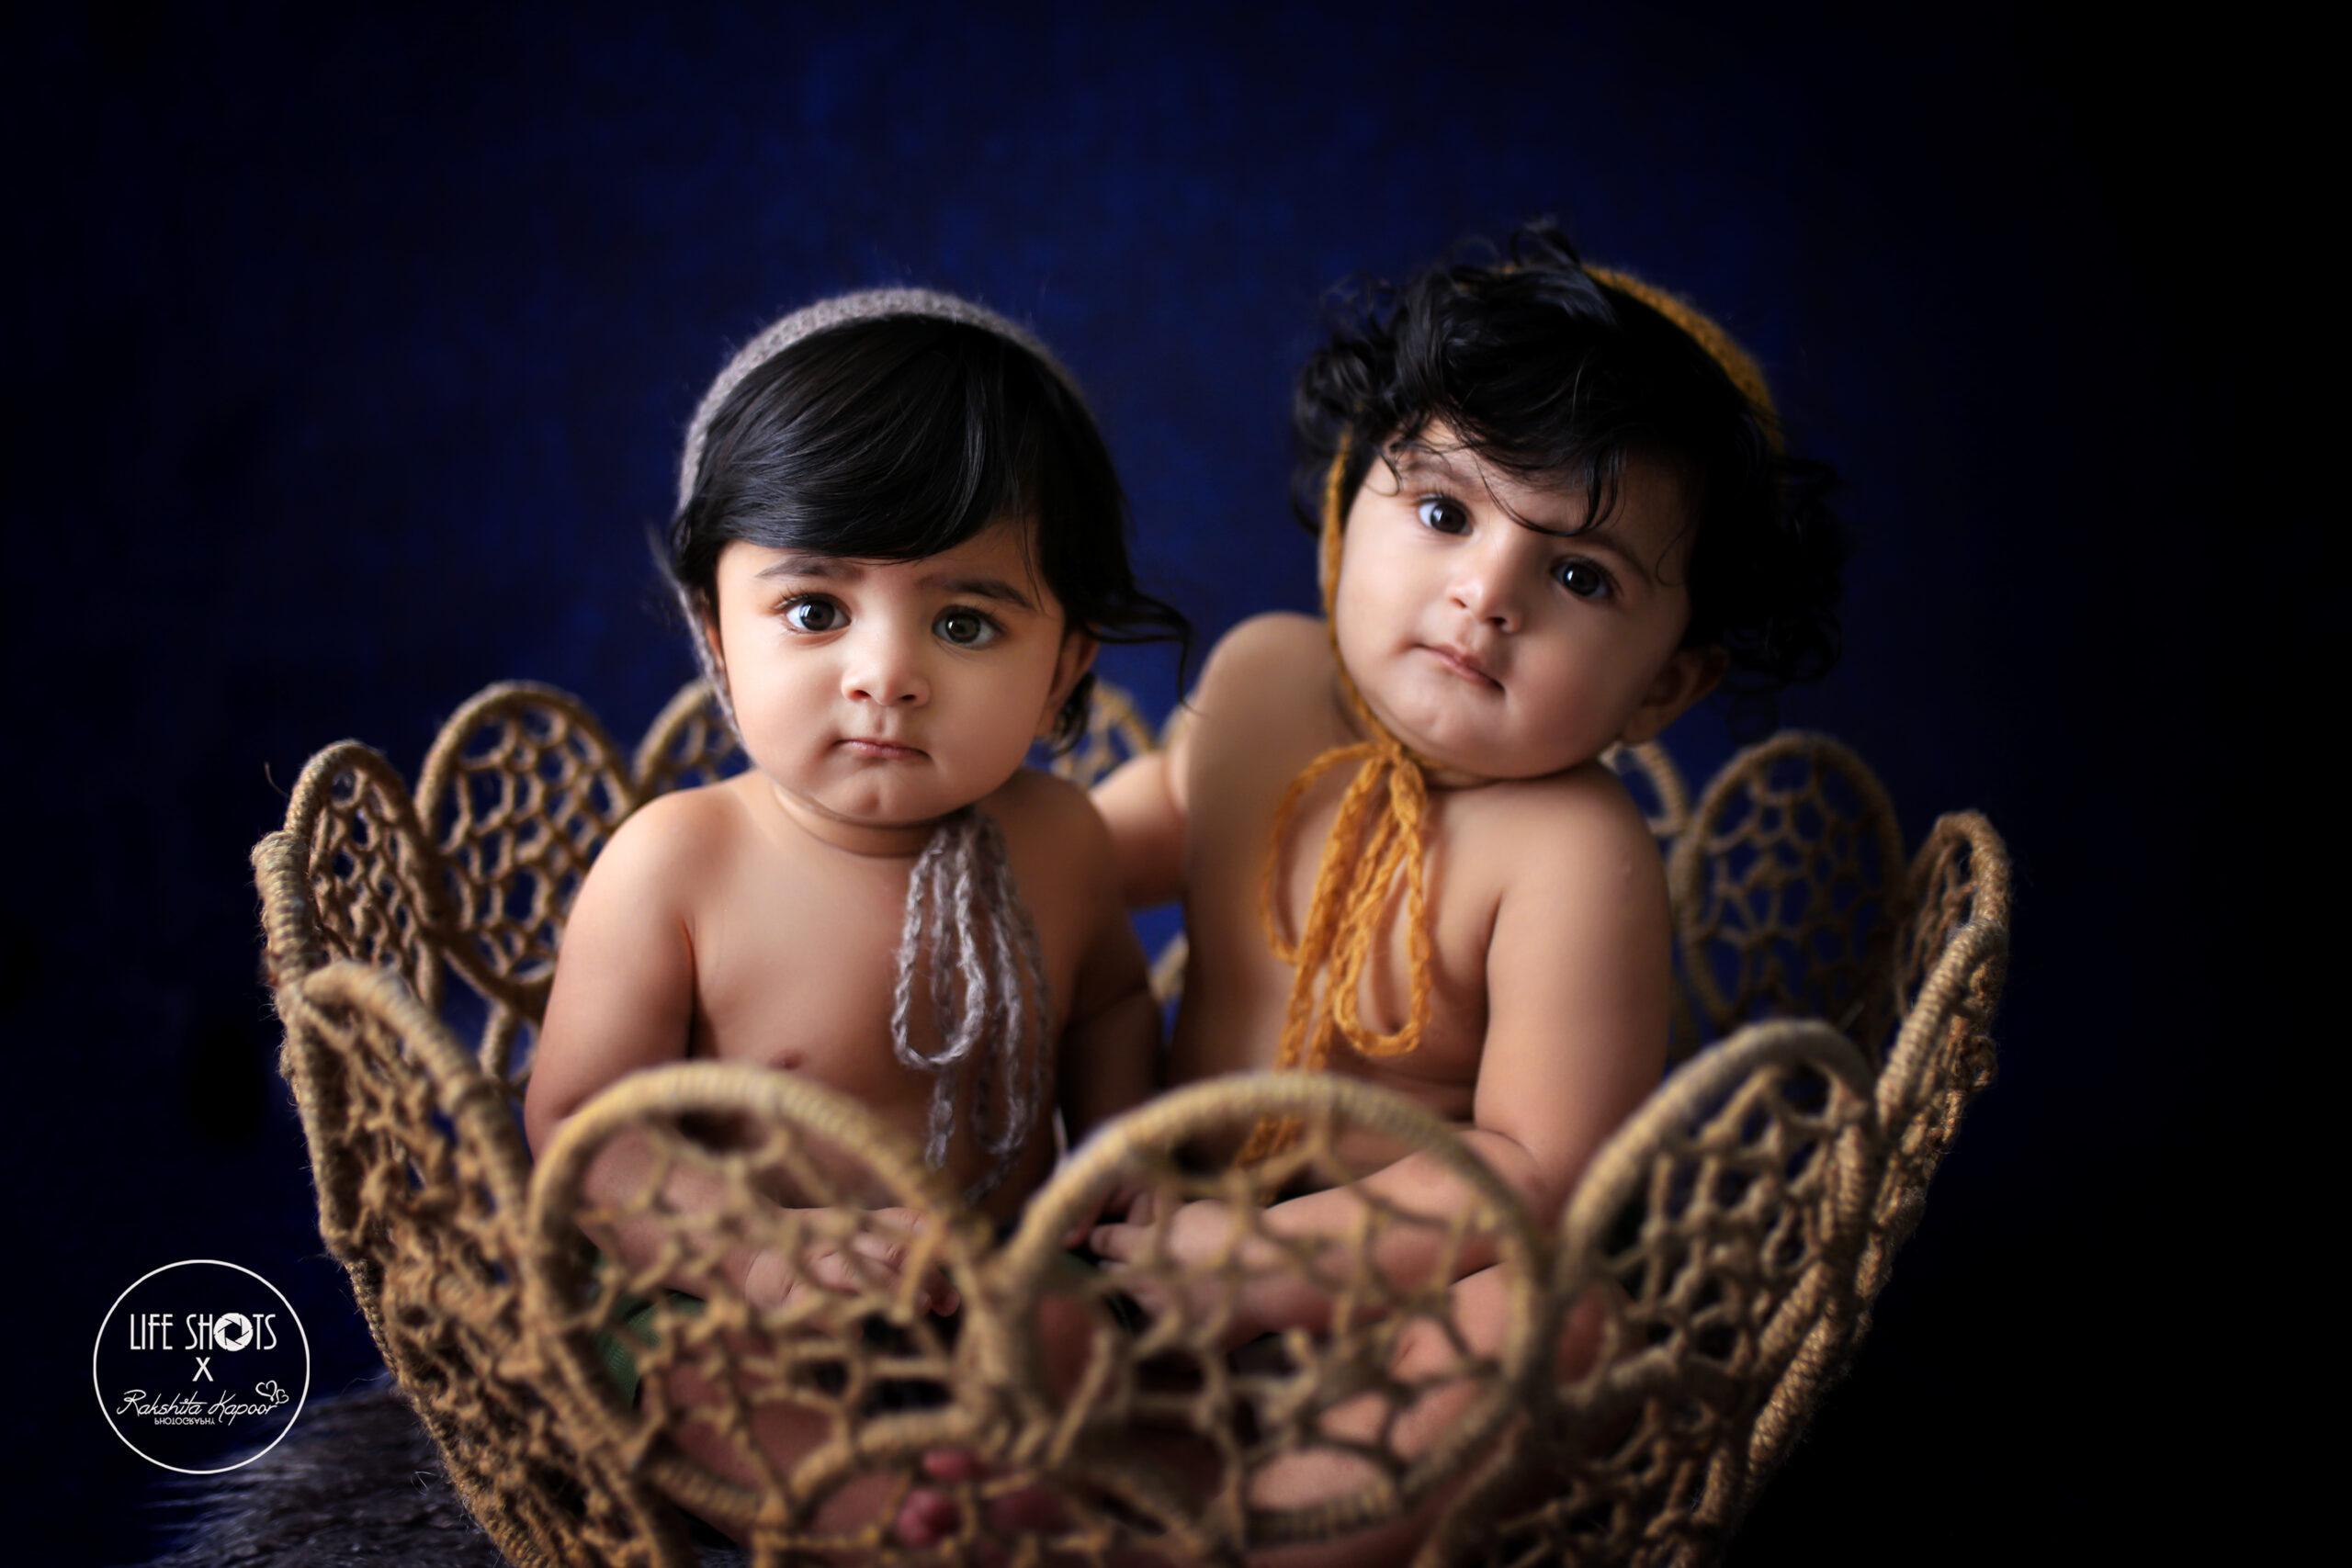 Best baby twins photography in Delhi NCR Noida Gurgaon Faridabad by Rakshita Kapoor